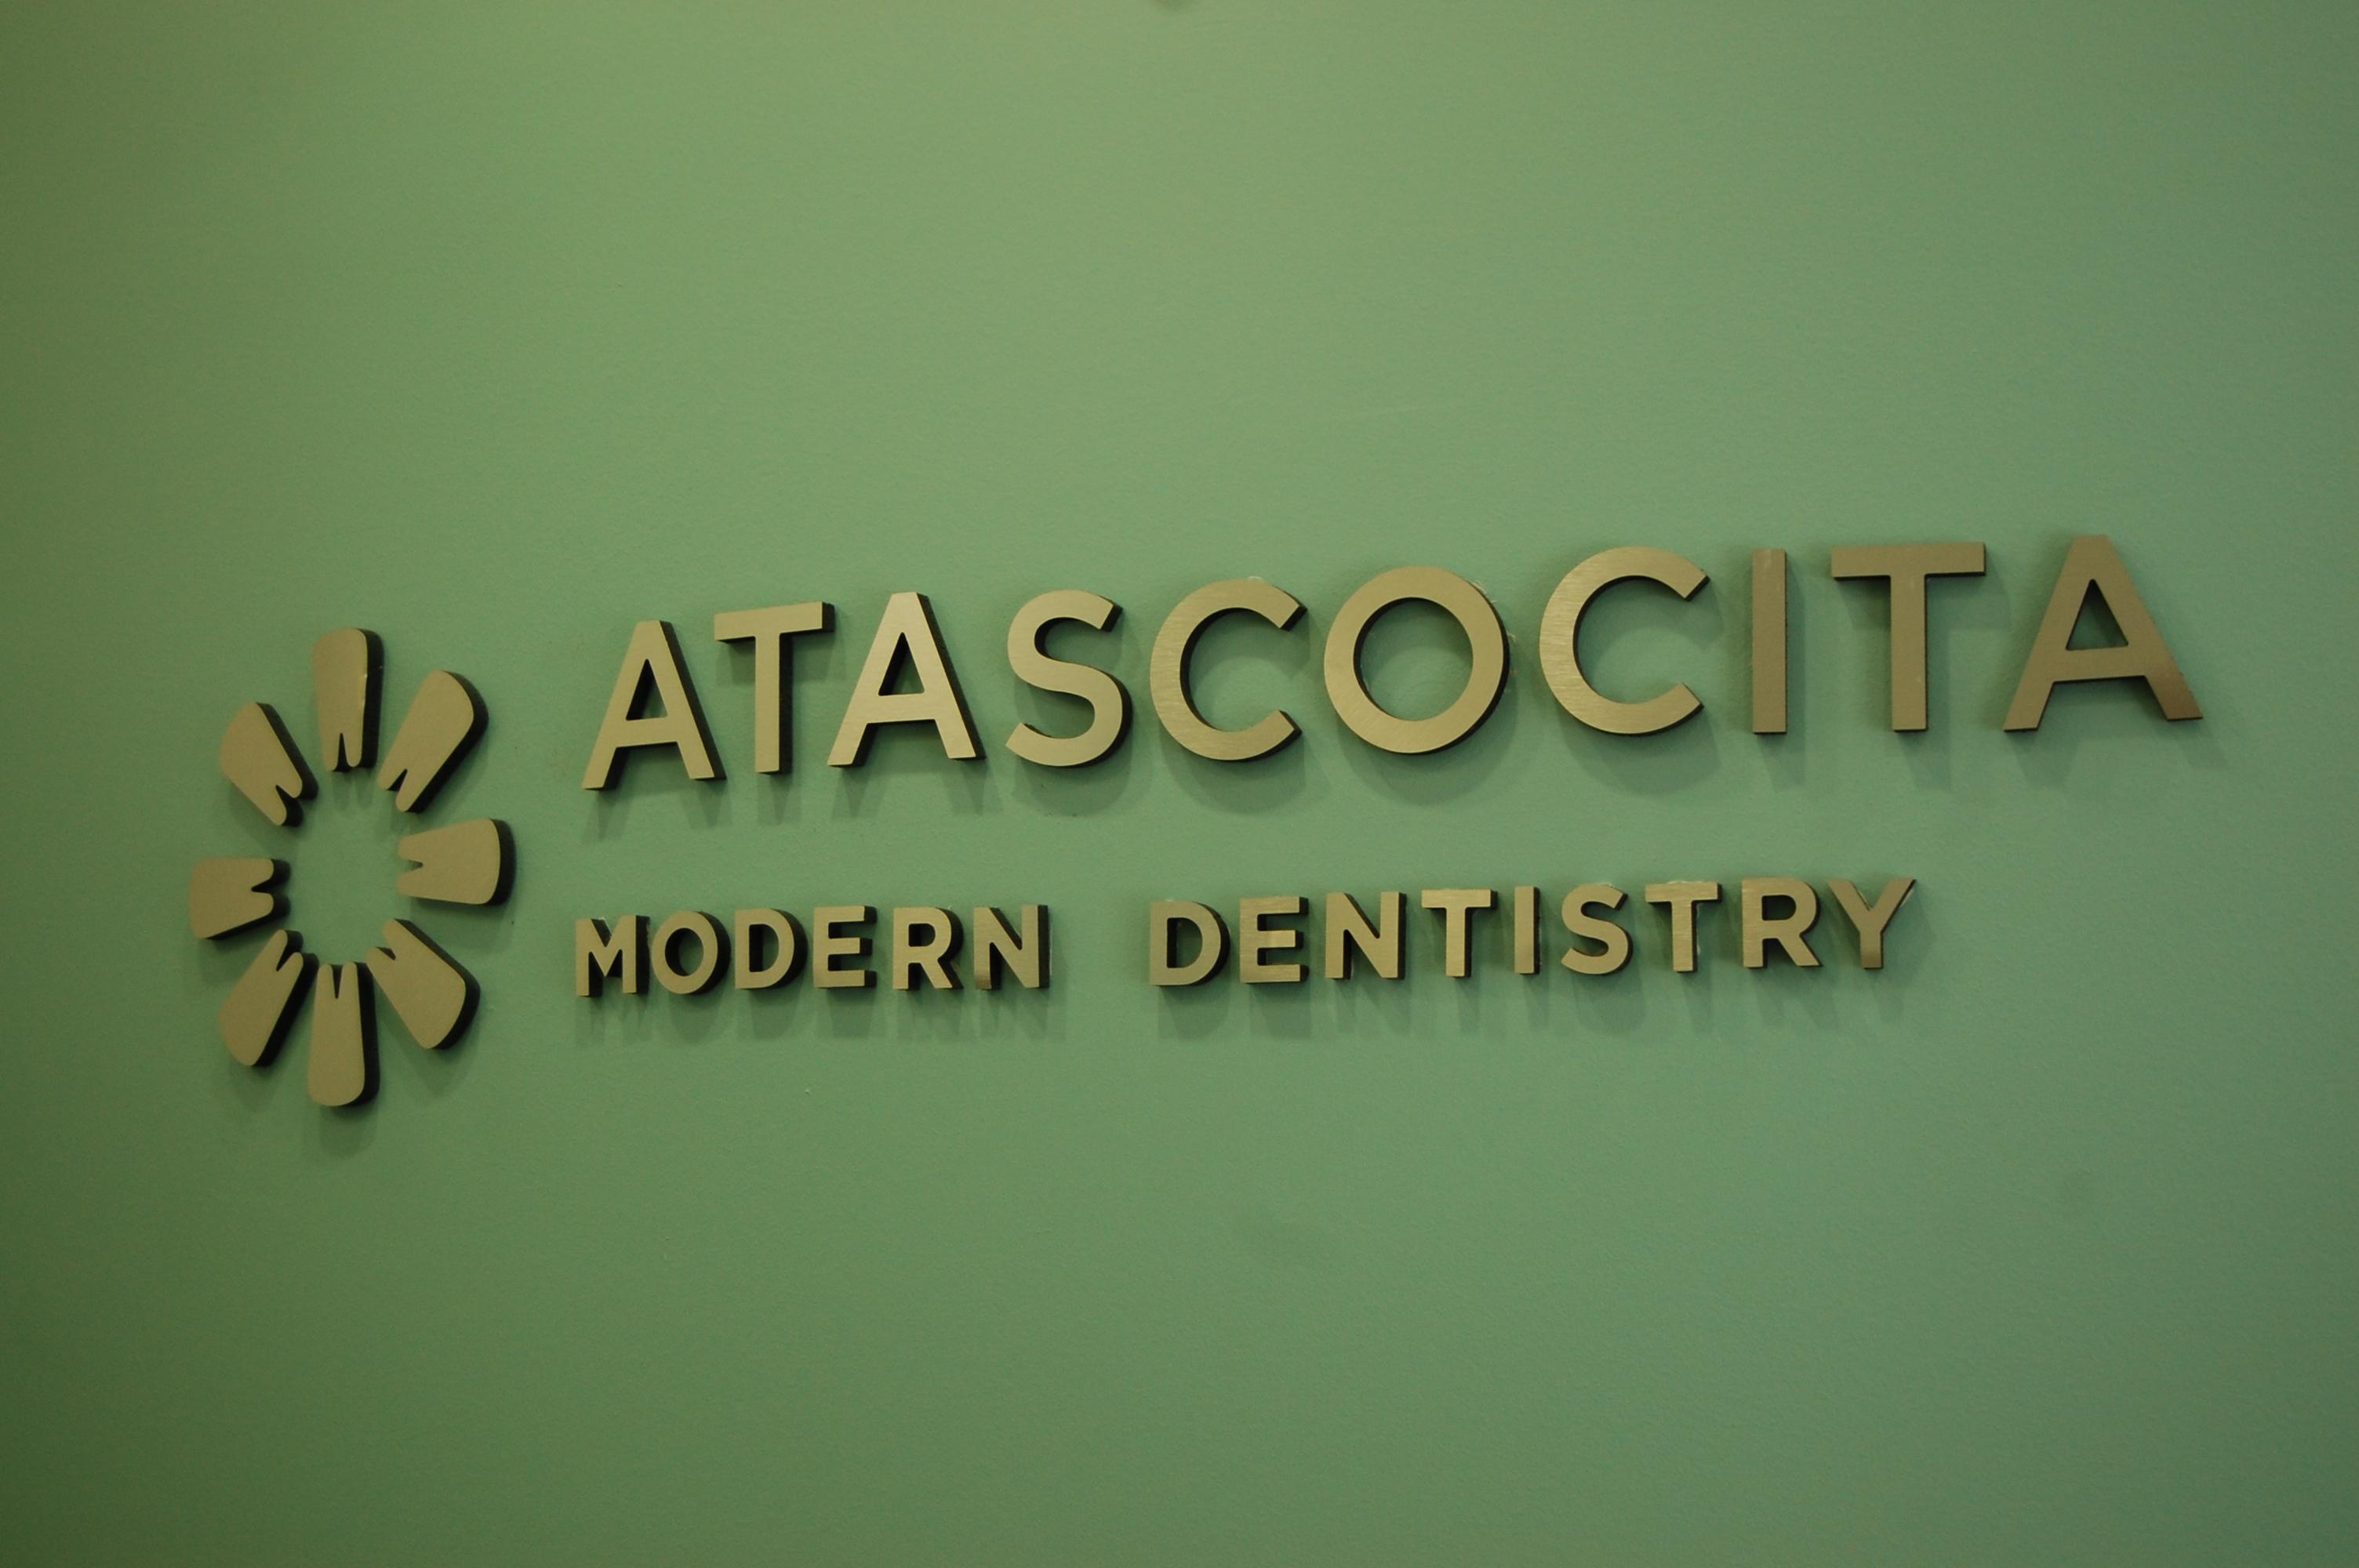 Atascocita Modern Dentistry and Orthodontics image 1